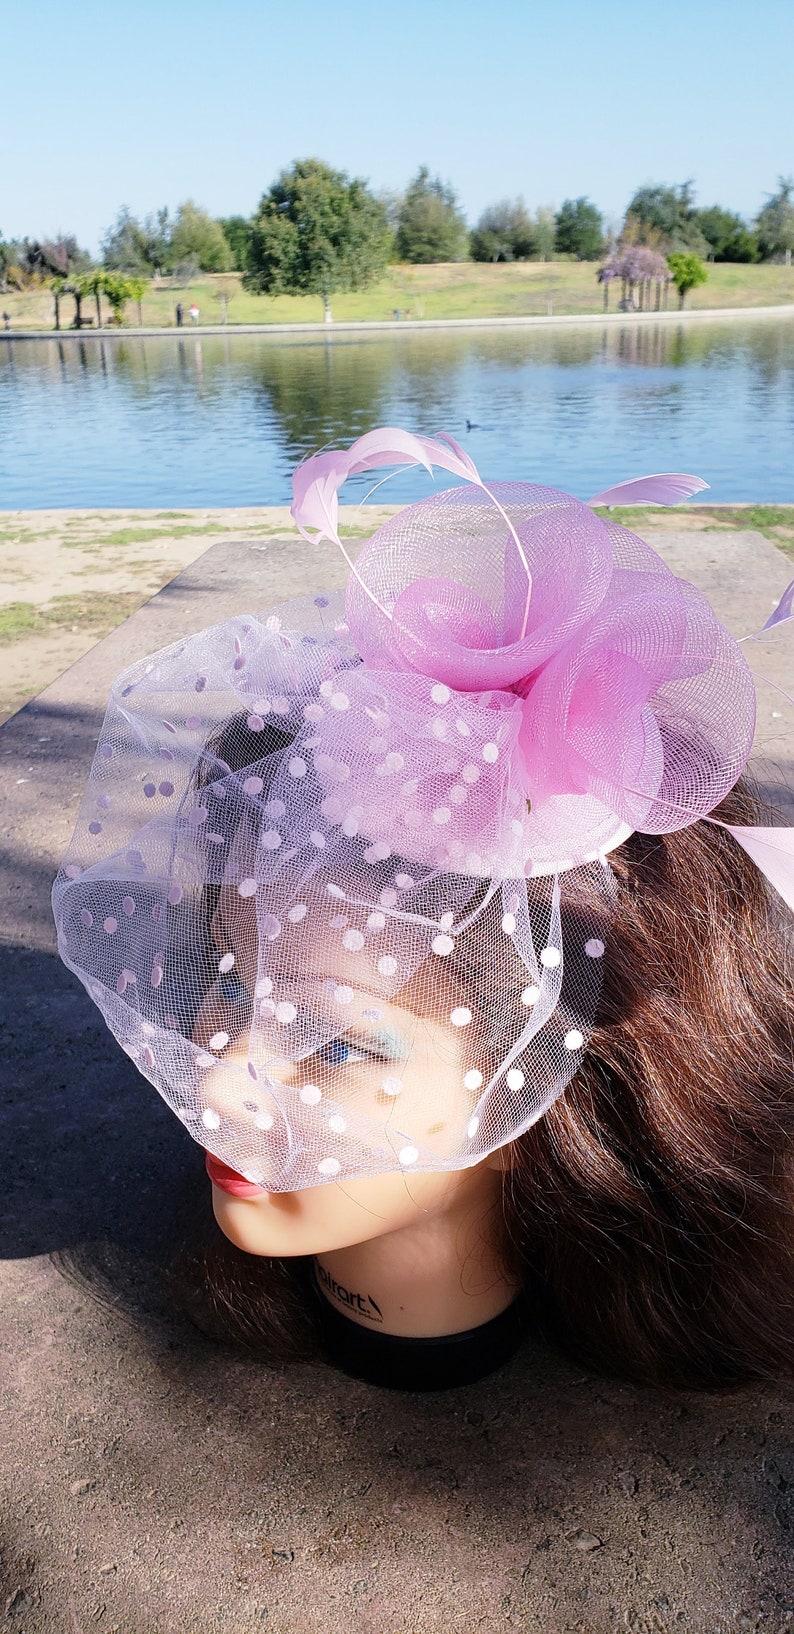 Wedding Tea Party Mini Hat.Costume Feather  Bird Cage Veil Hair Clip Head Accessory.Headpiece Pink Fascinator Derby Race Bridal Church Hat